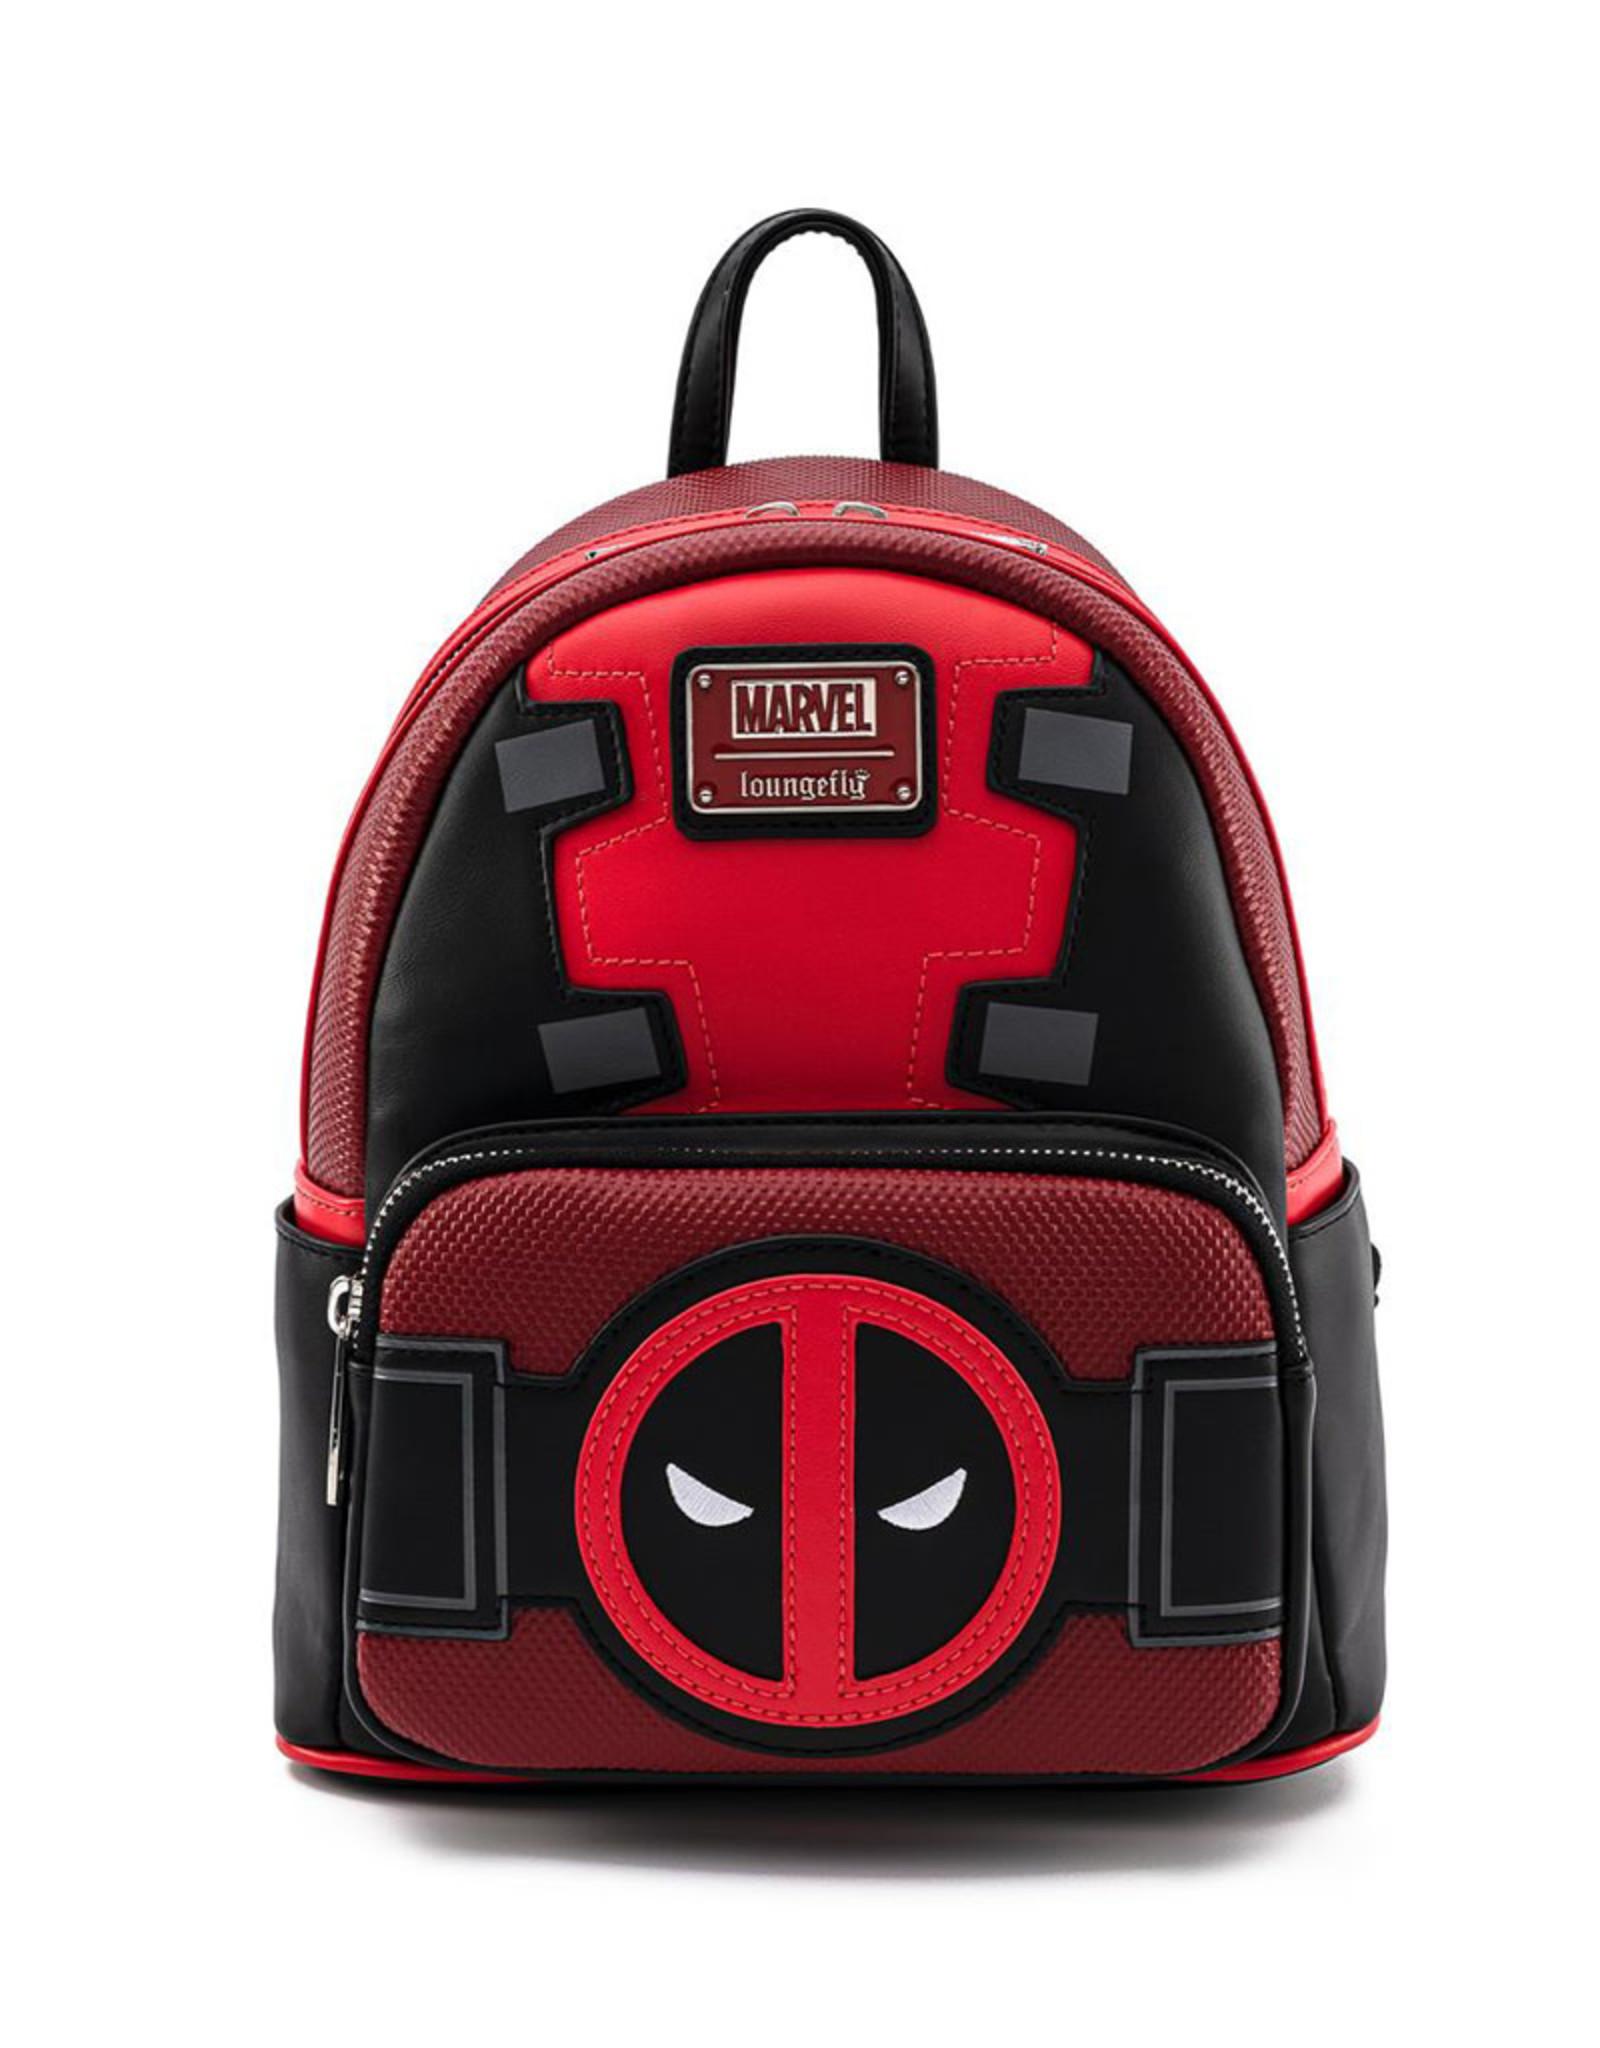 Marvel Marvel ( loungefly Mini Backpack ) Deadpool